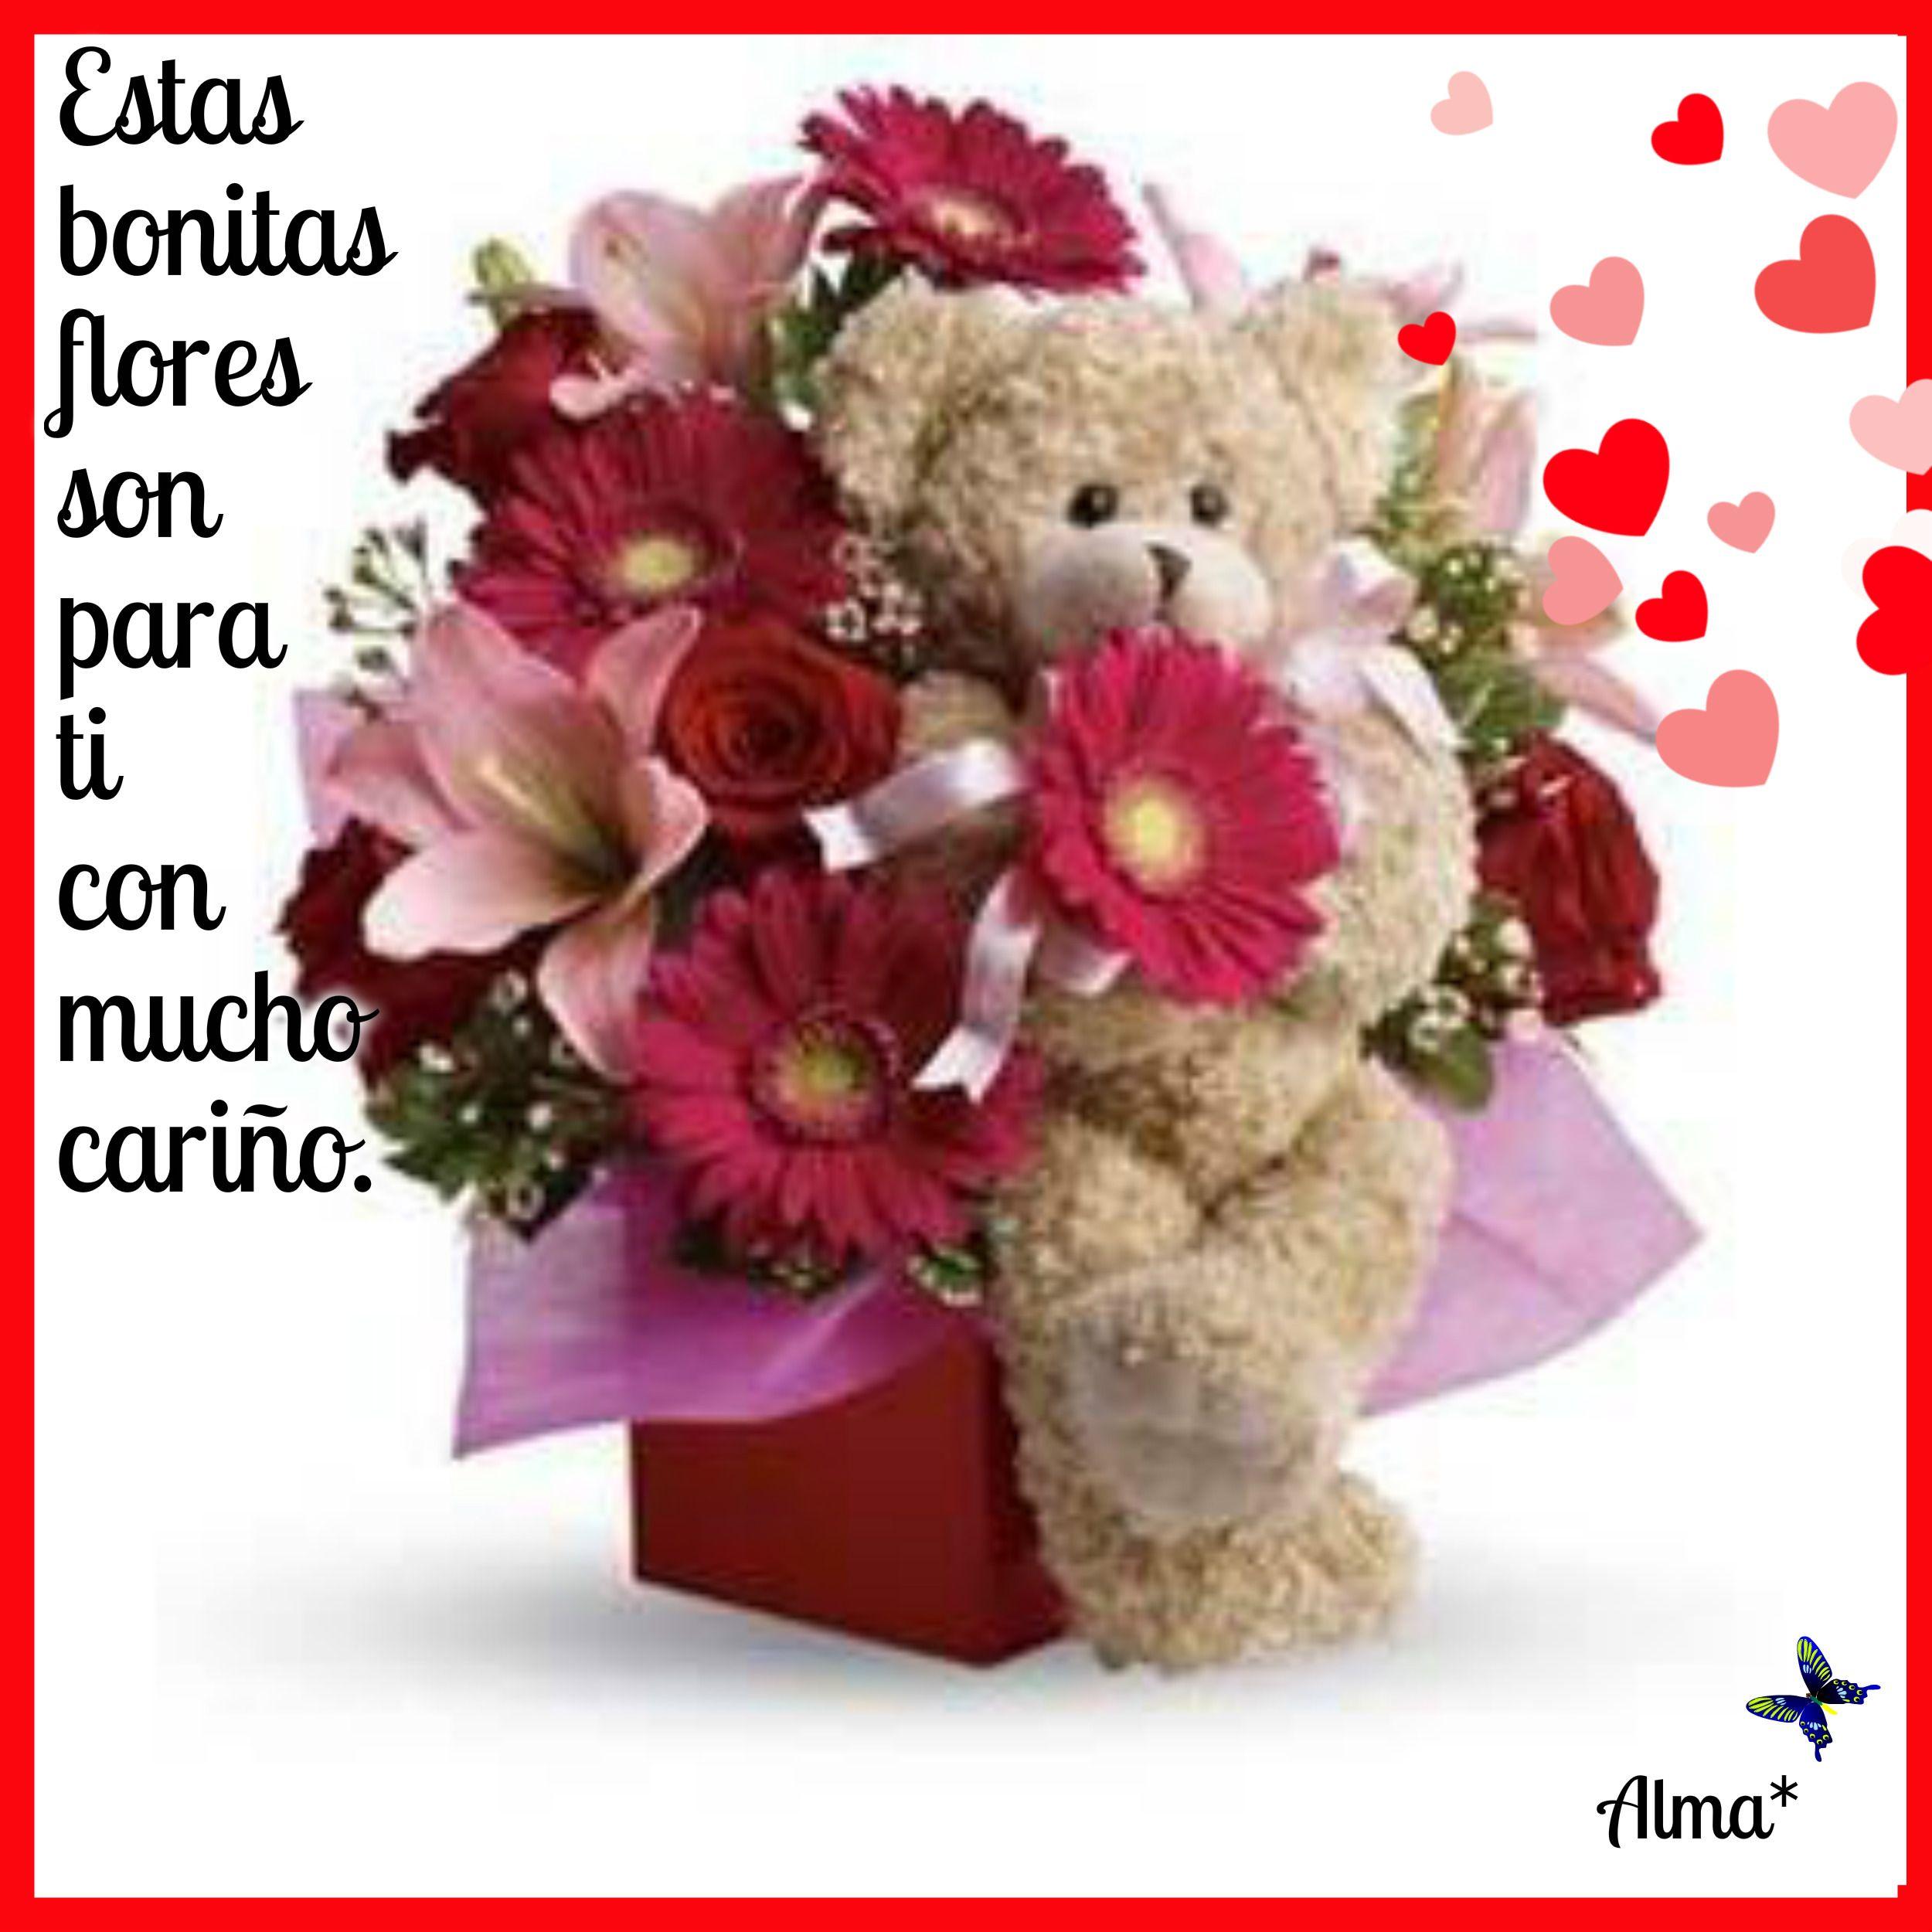 Estas bonitas flores son para ti con mucho cariño